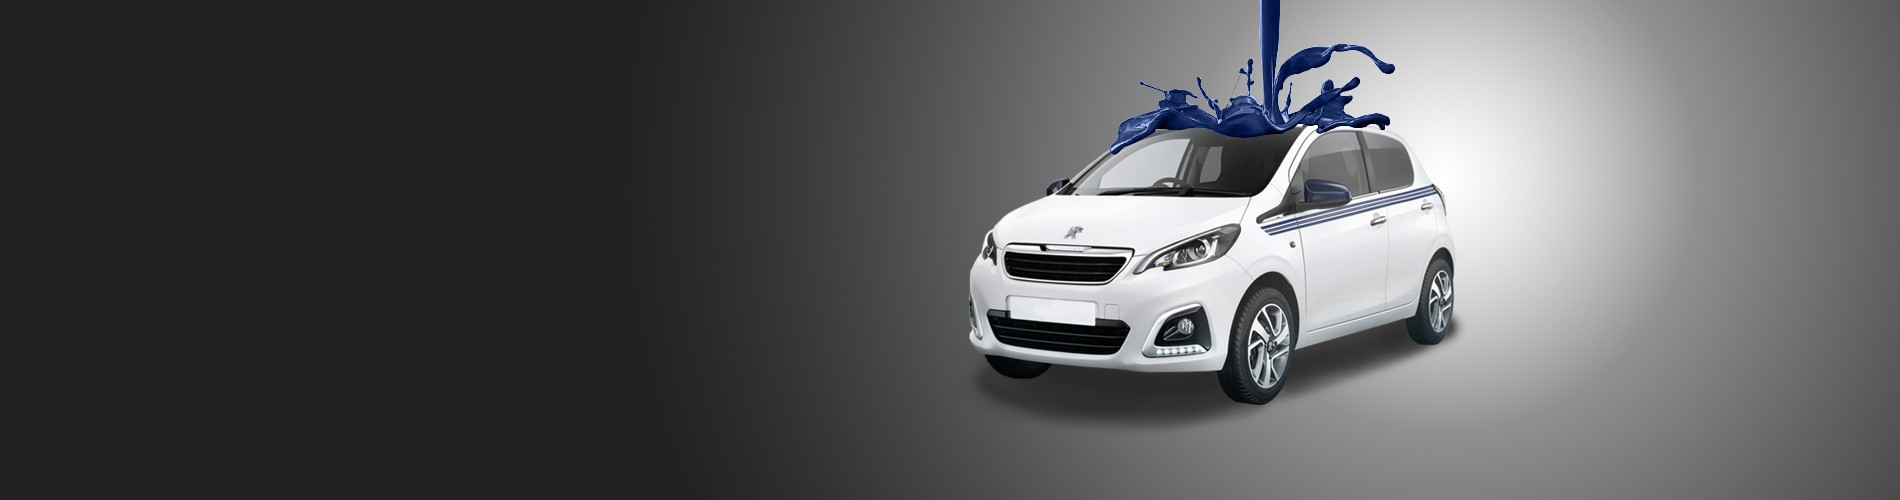 My Beautiful Car - Peugeot 108 Stickers